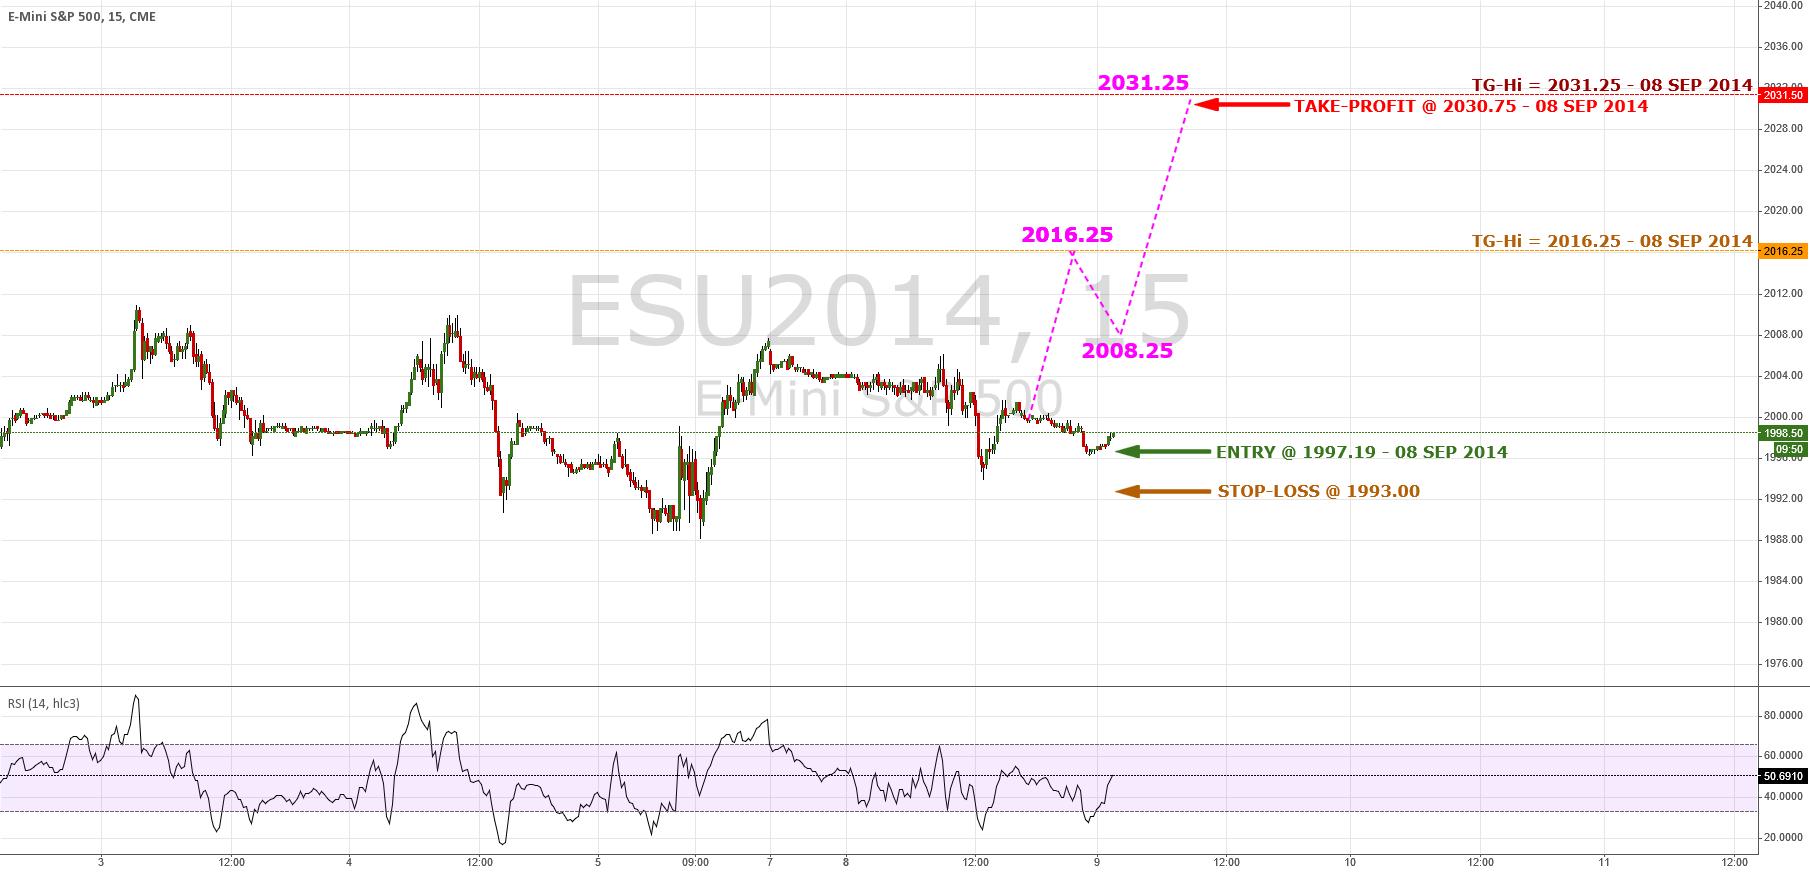 #ES Signals Reversal To Higher High Per Model   #SP500 $SPX $SPY